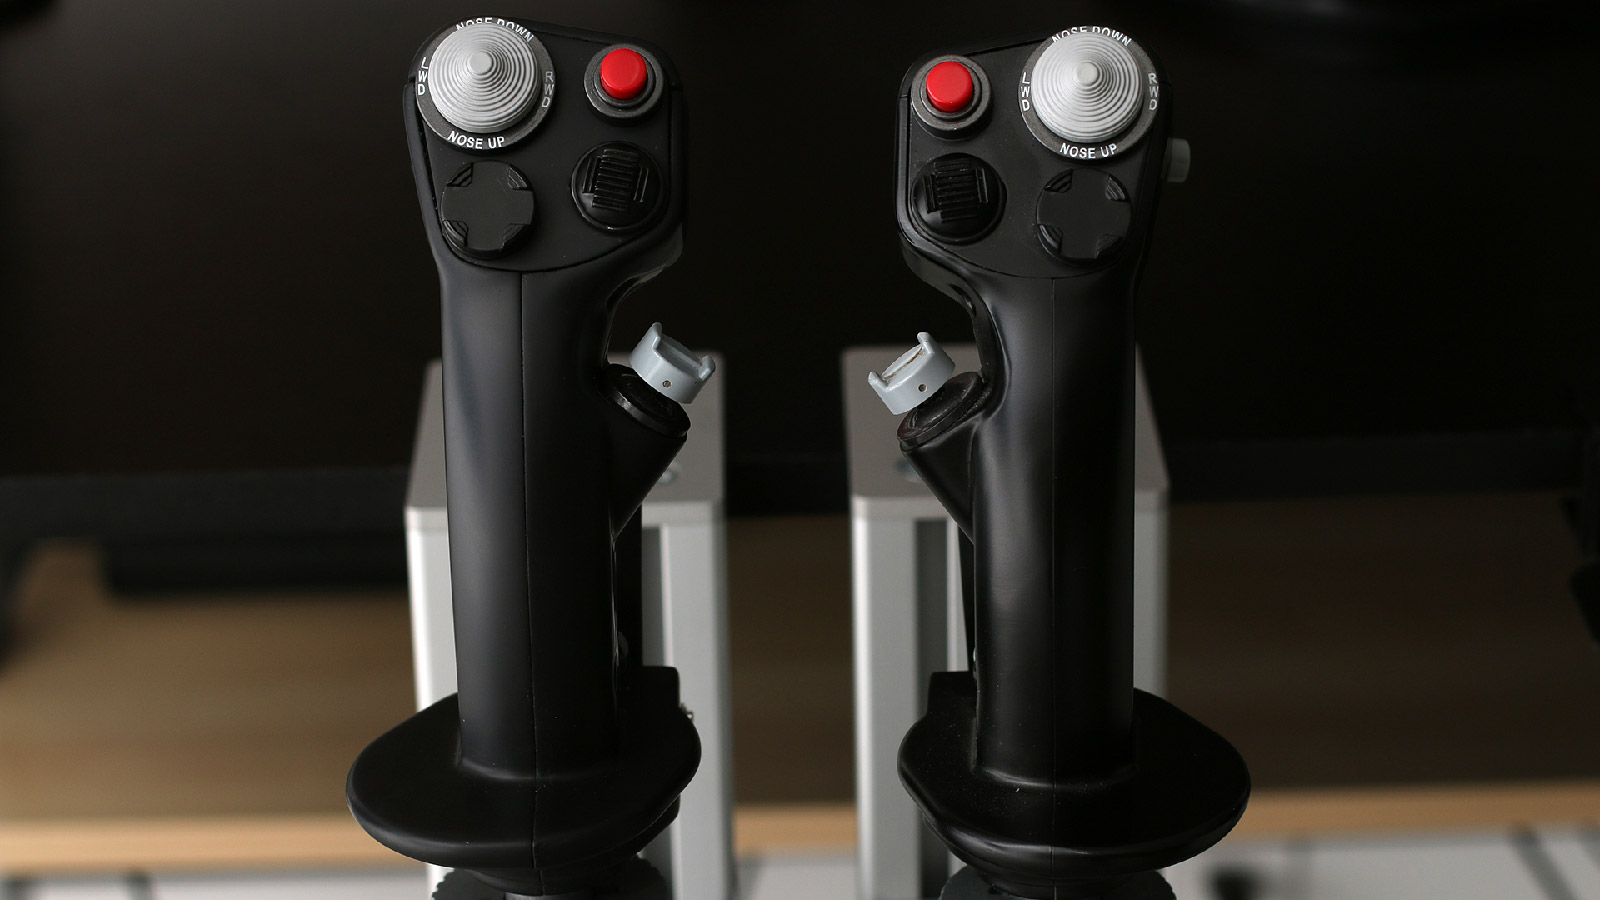 Aluminium Joystick/HOTAS table mounts - Monster Tech - Page 8 - ED